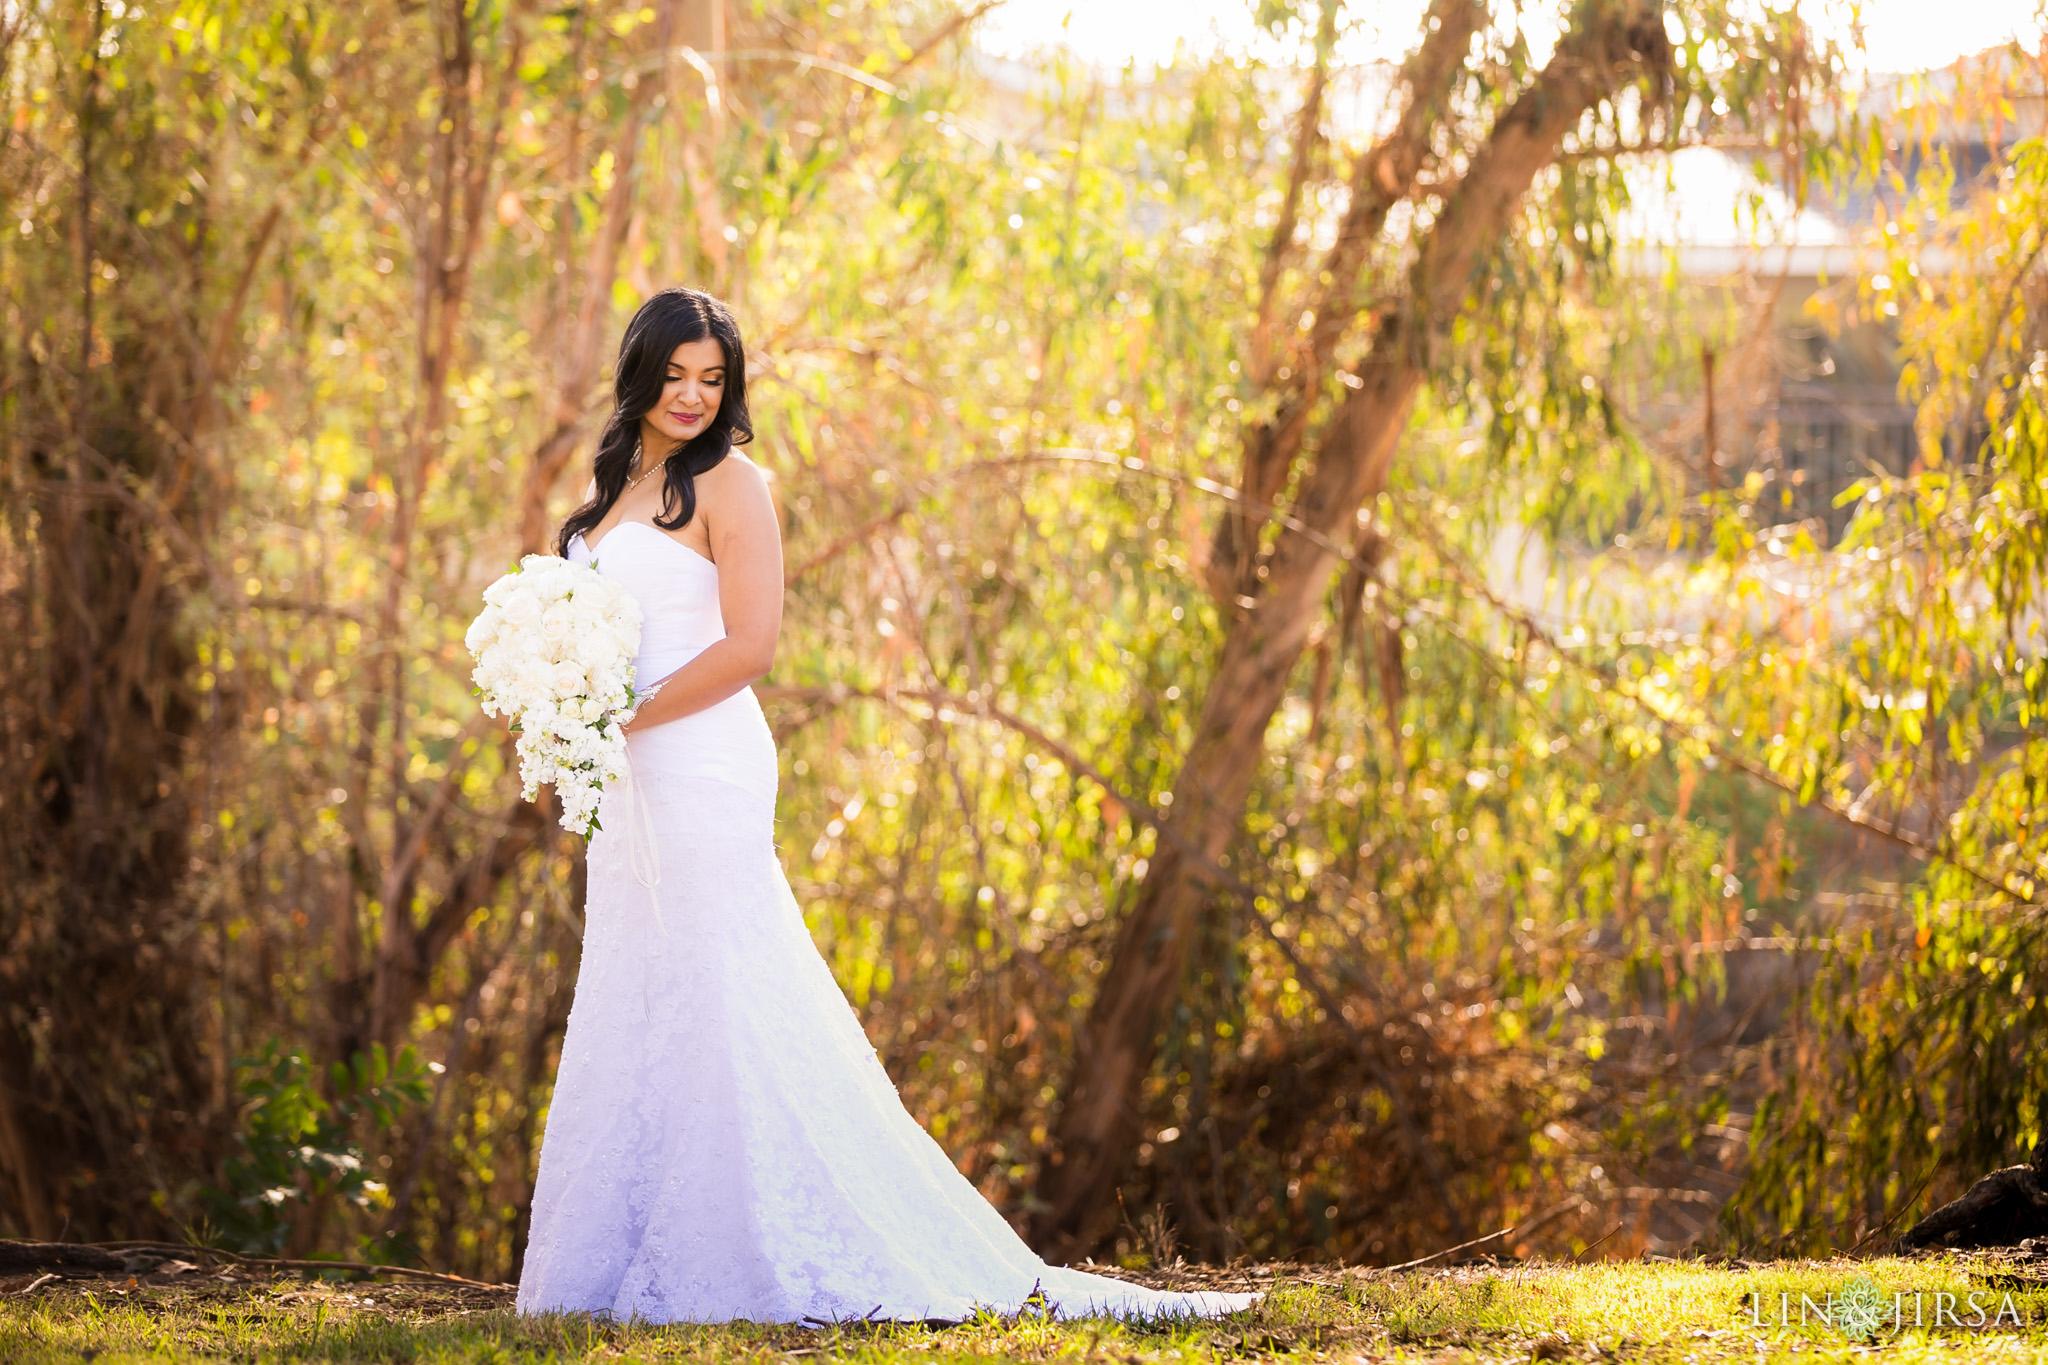 06 Orange County Indian Bride Wedding Photography